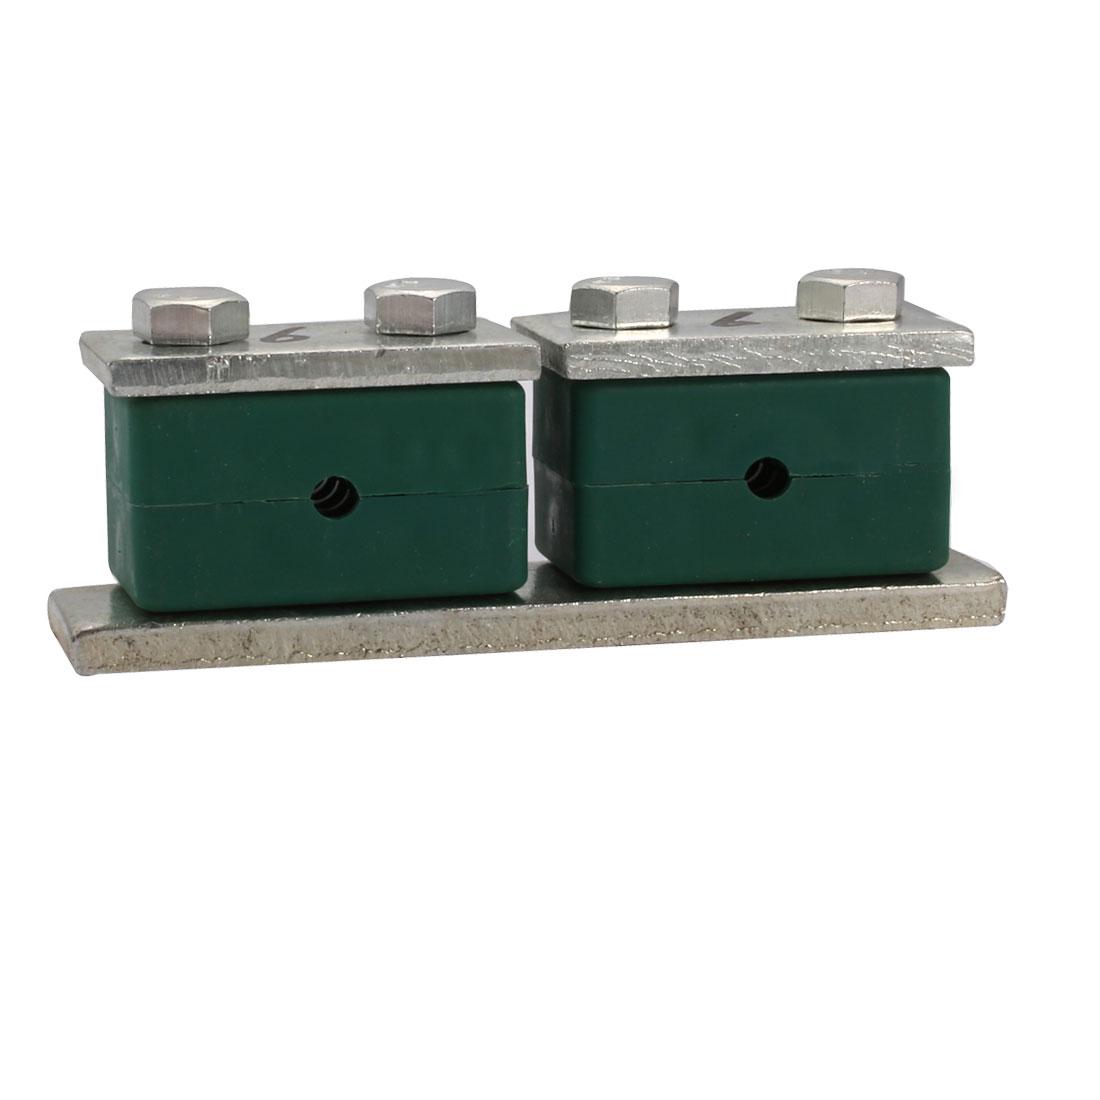 Twin Series Beta Heavy Hose Pipe Clamp Polypropylene Fit 6mm Tube Diameter